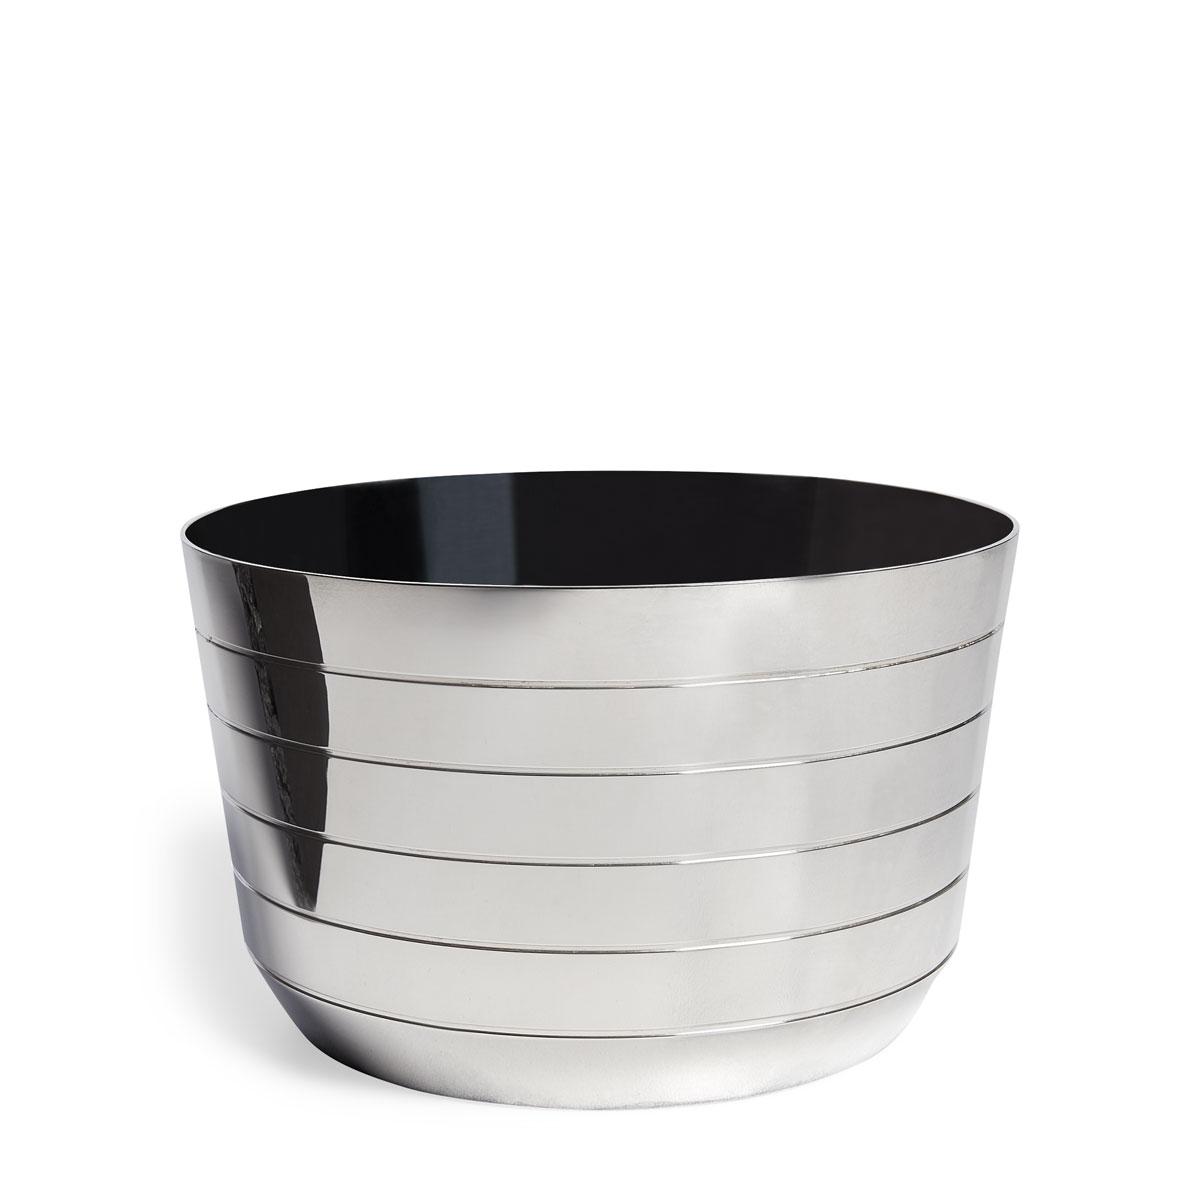 Ralph Lauren Montgomery Medium Nut Bowl